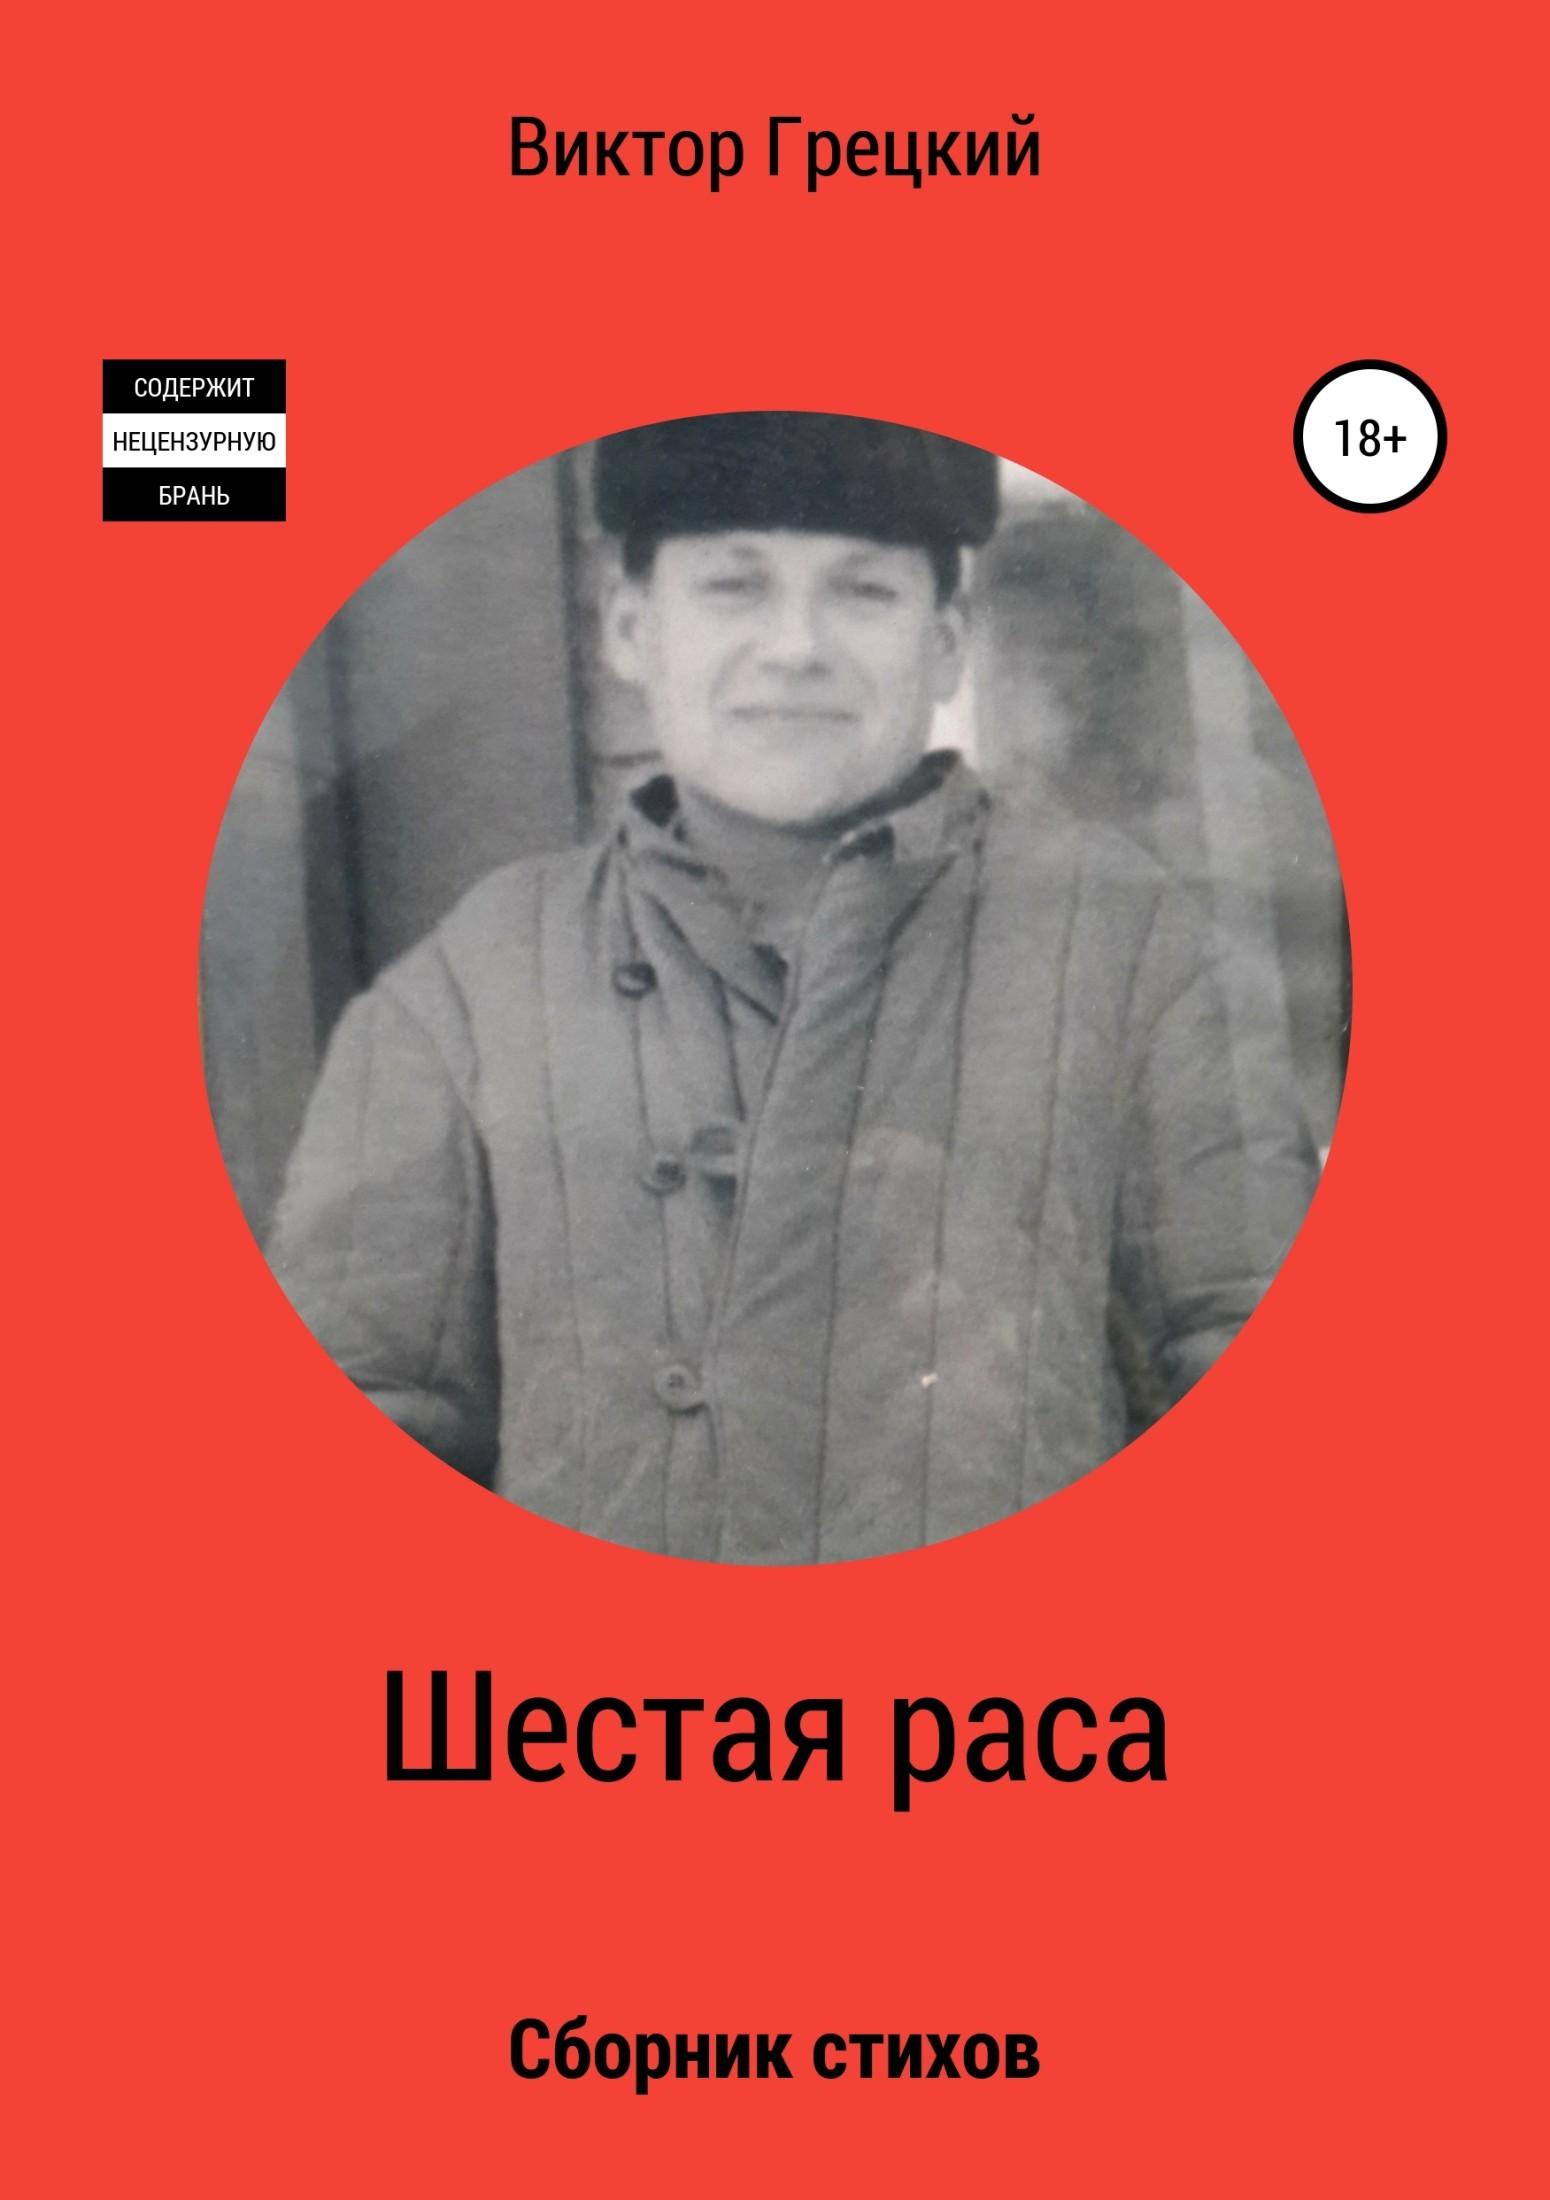 Виктор Грецкий Шестая раса. Сборник стихотворений